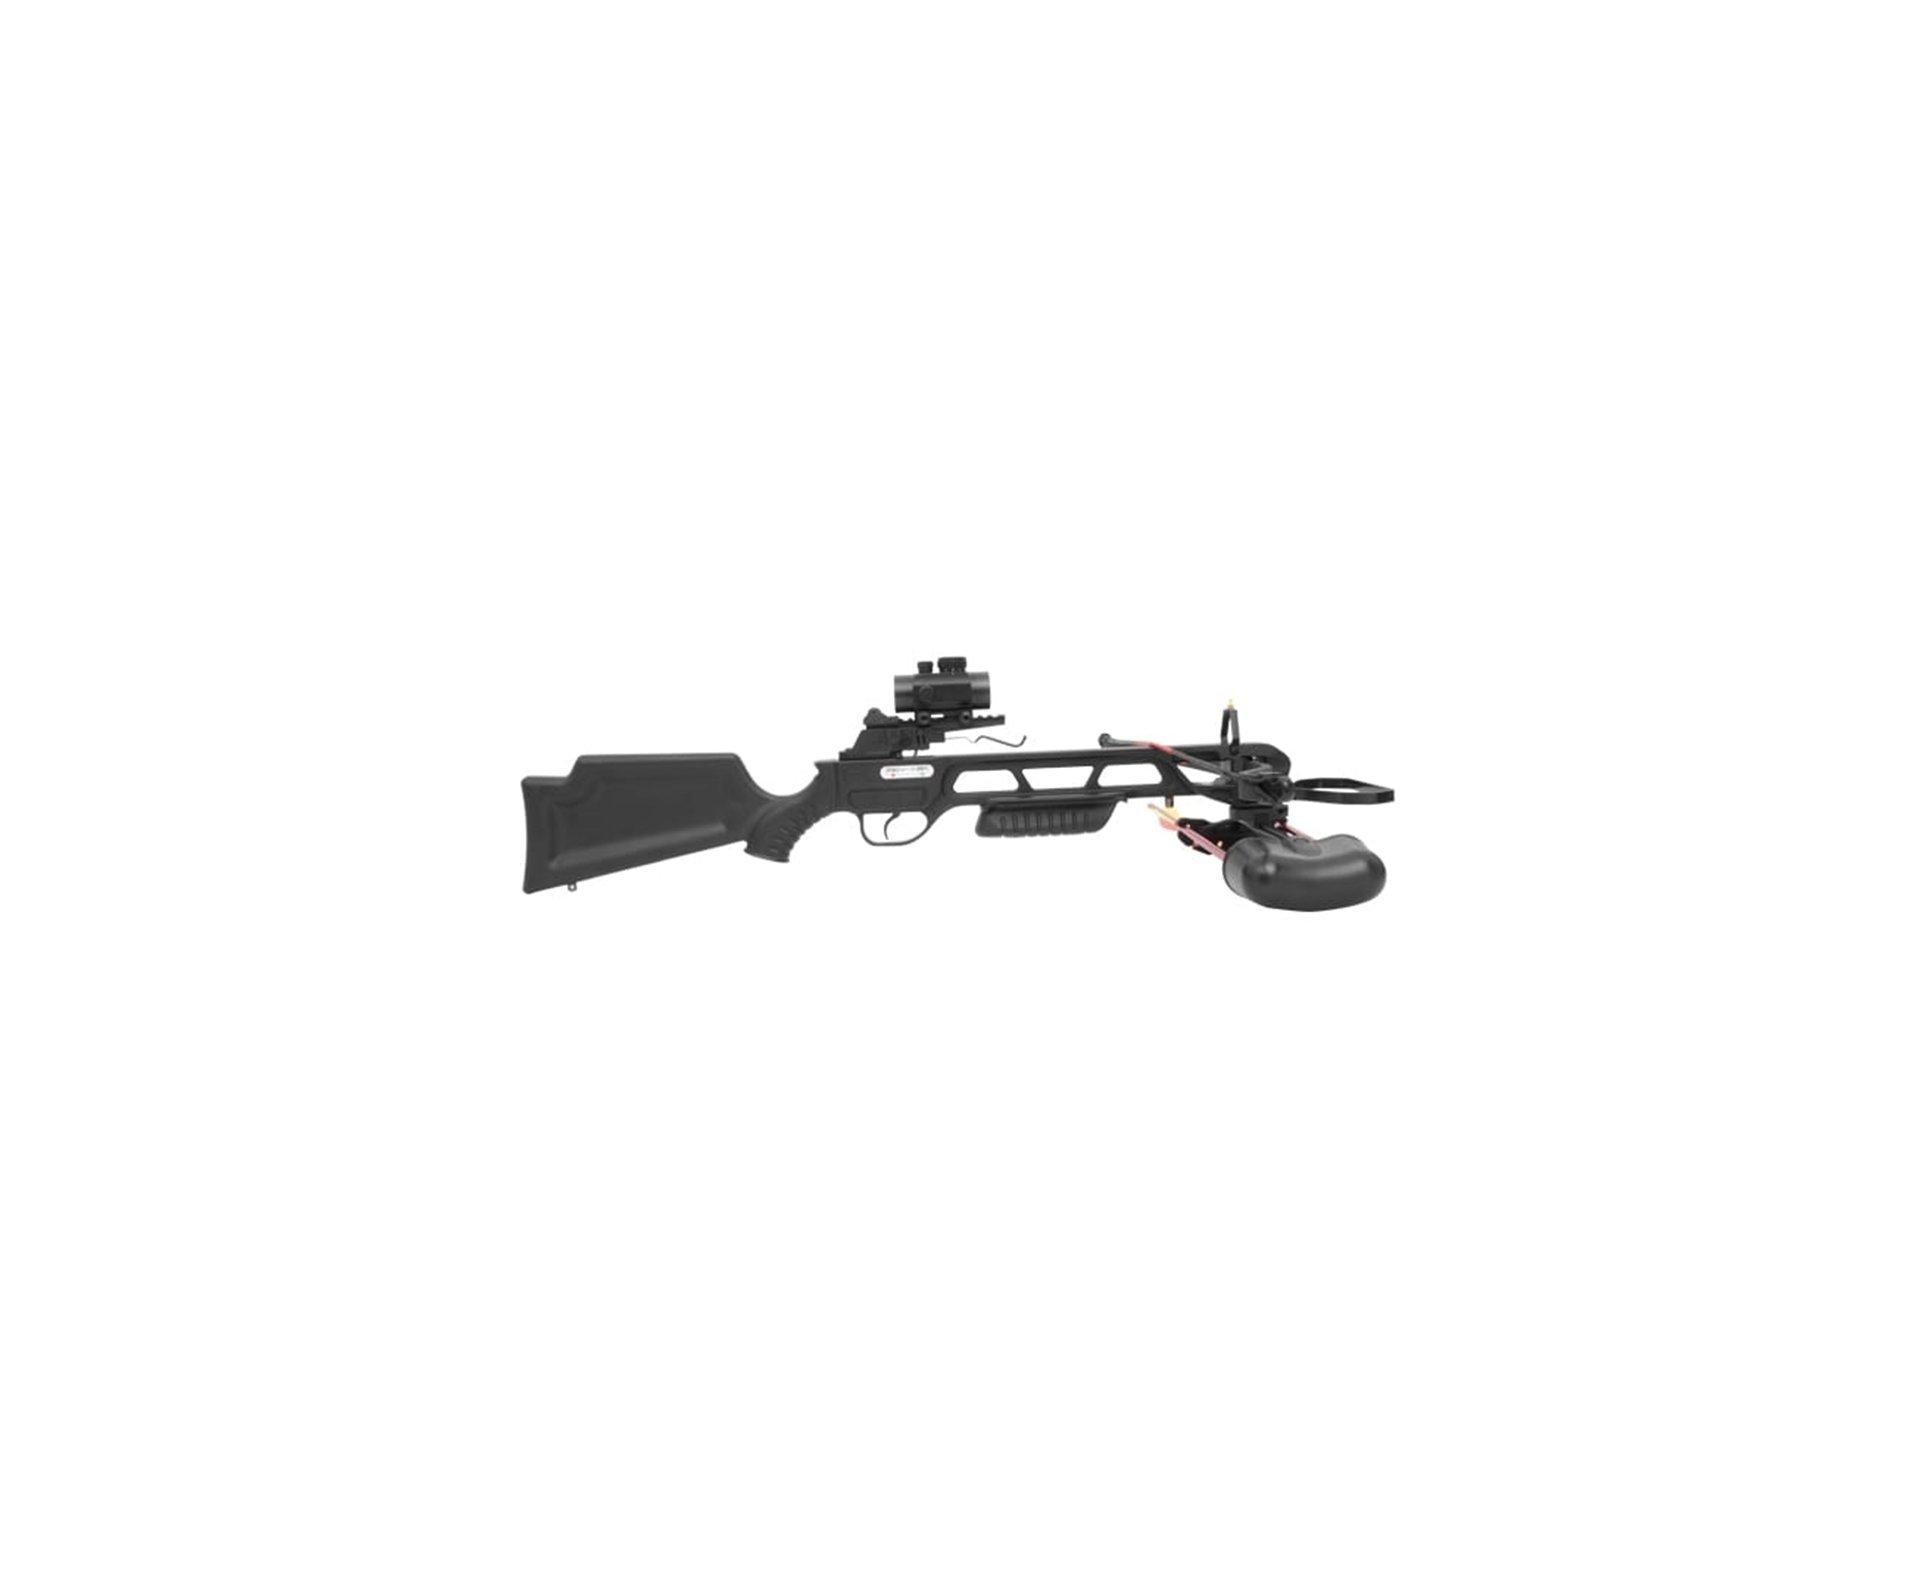 Besta/balestra Recurvo Kit Mk-175- 160 Lbs + Red Dot + Bandoleira + Quiver - Man Kung